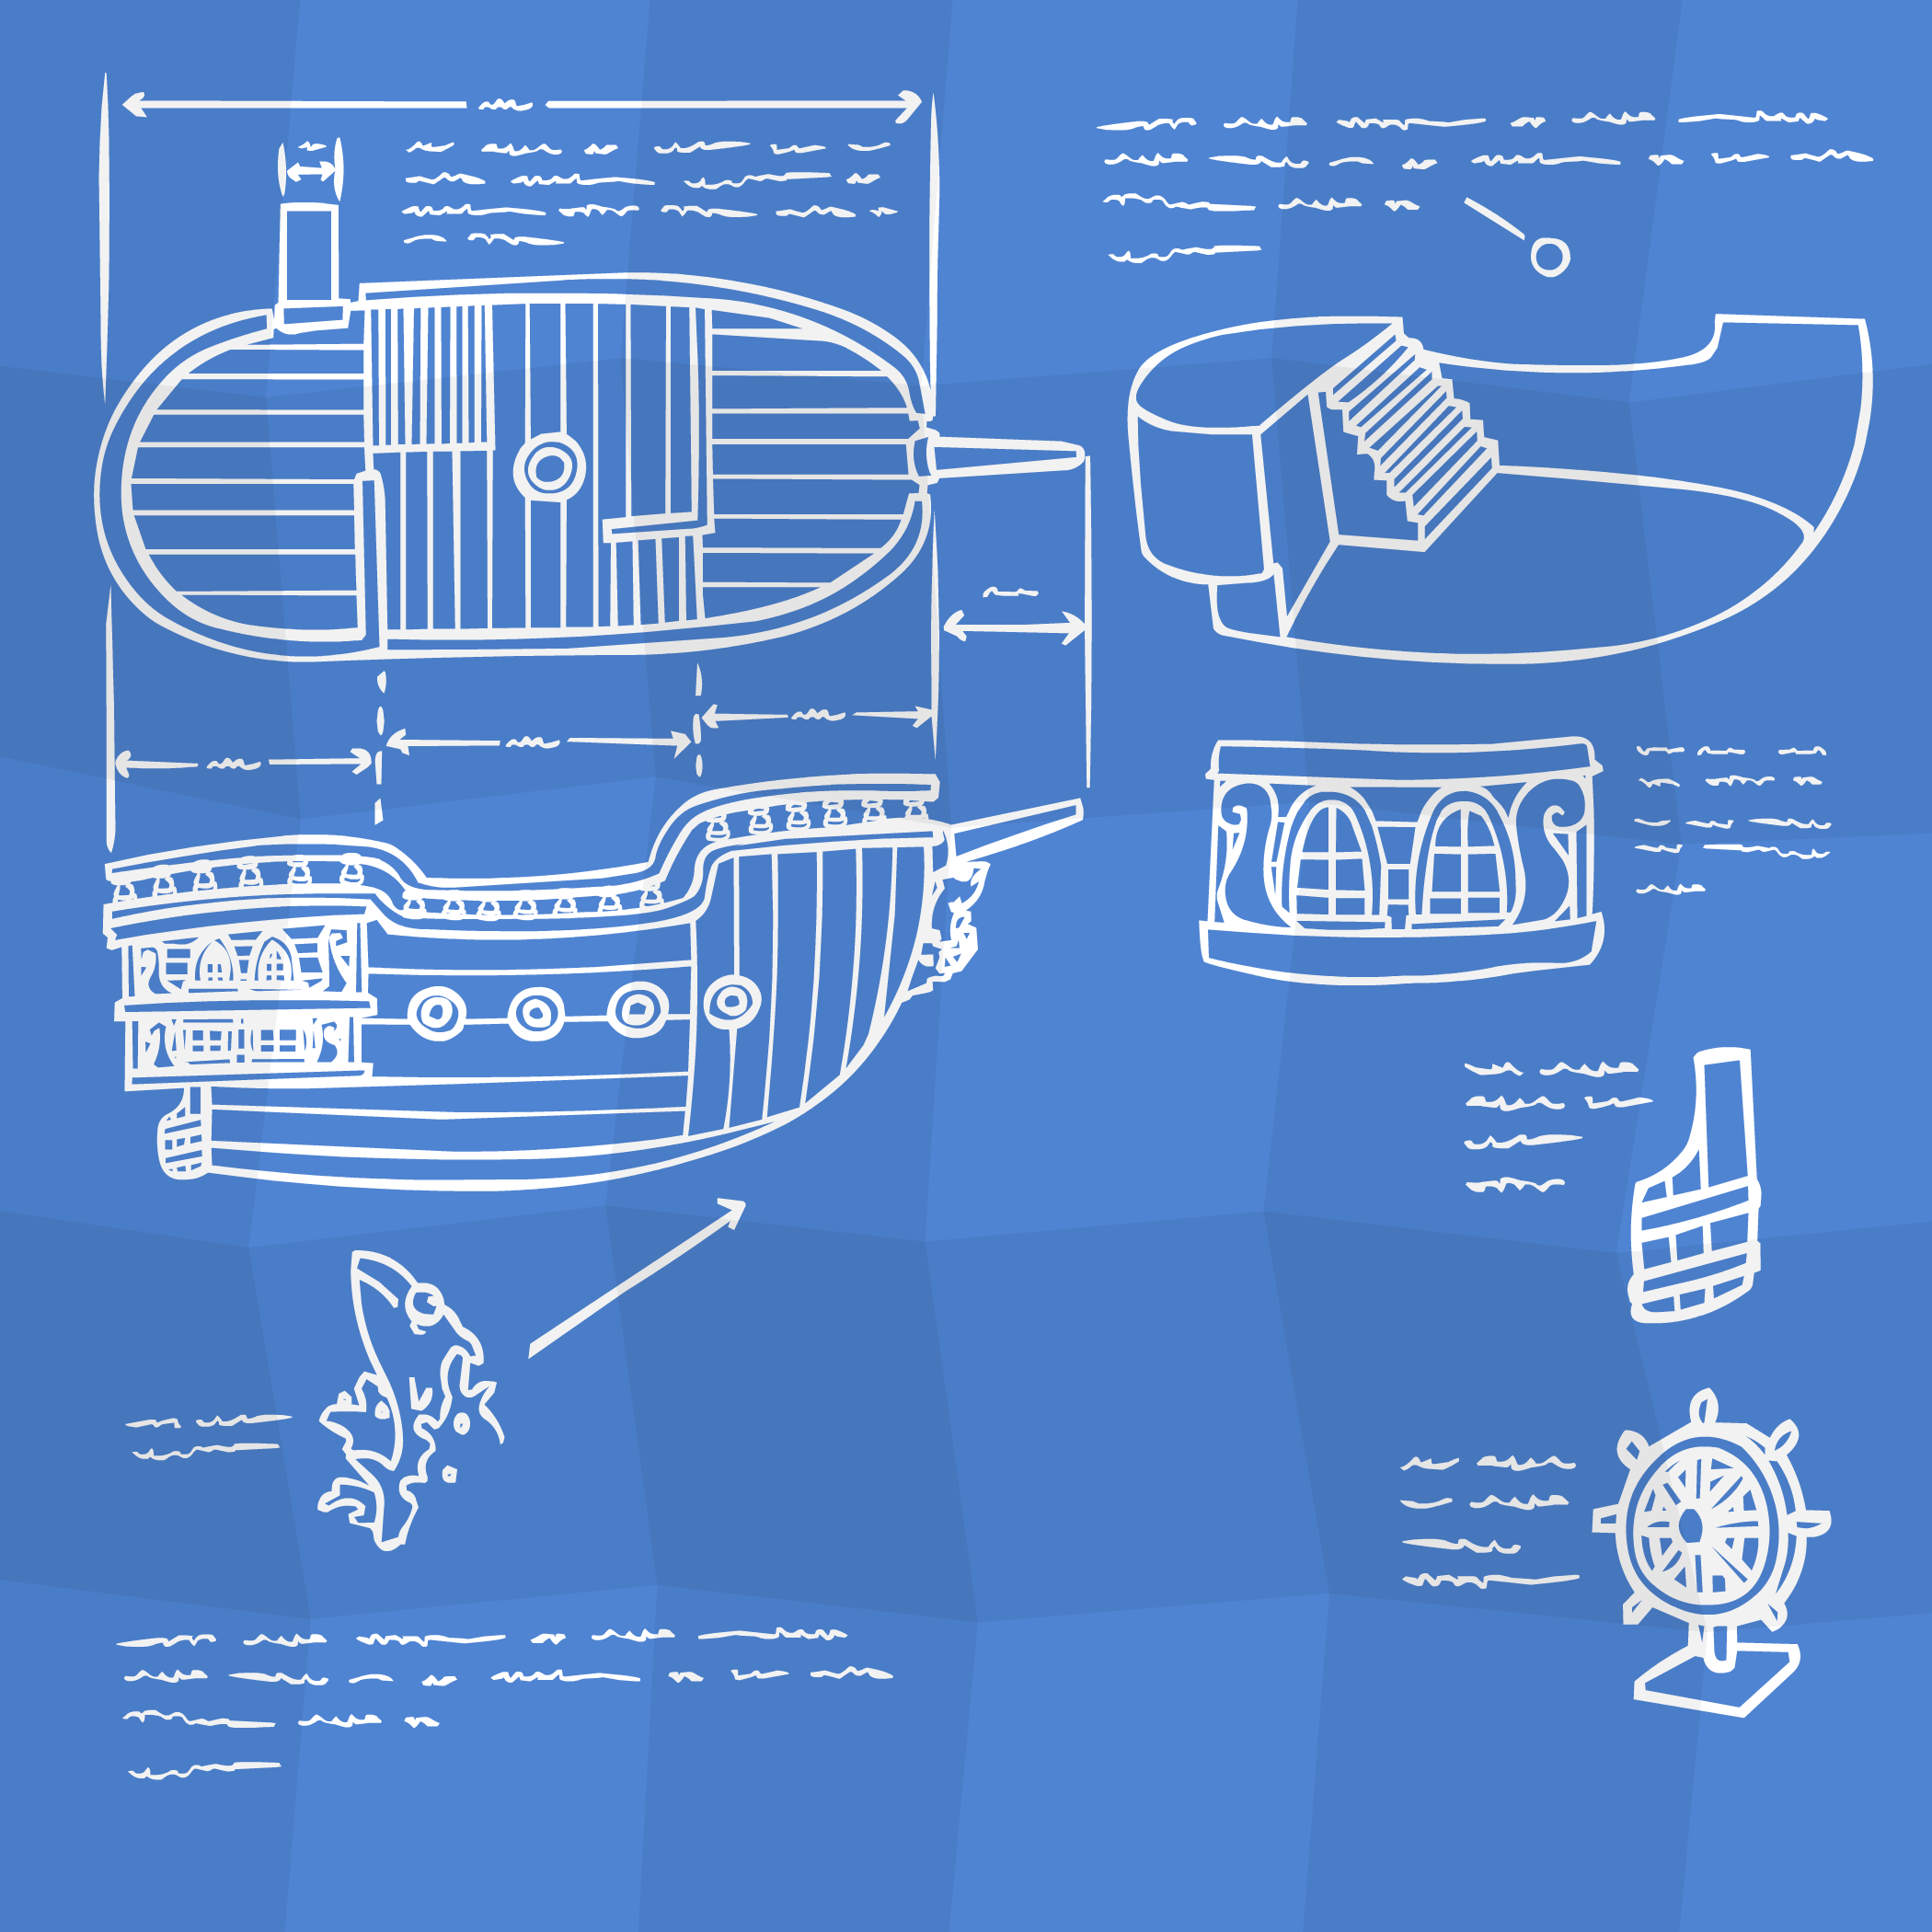 Blueprints background club penguin wiki fandom powered by wikia blueprints background malvernweather Gallery